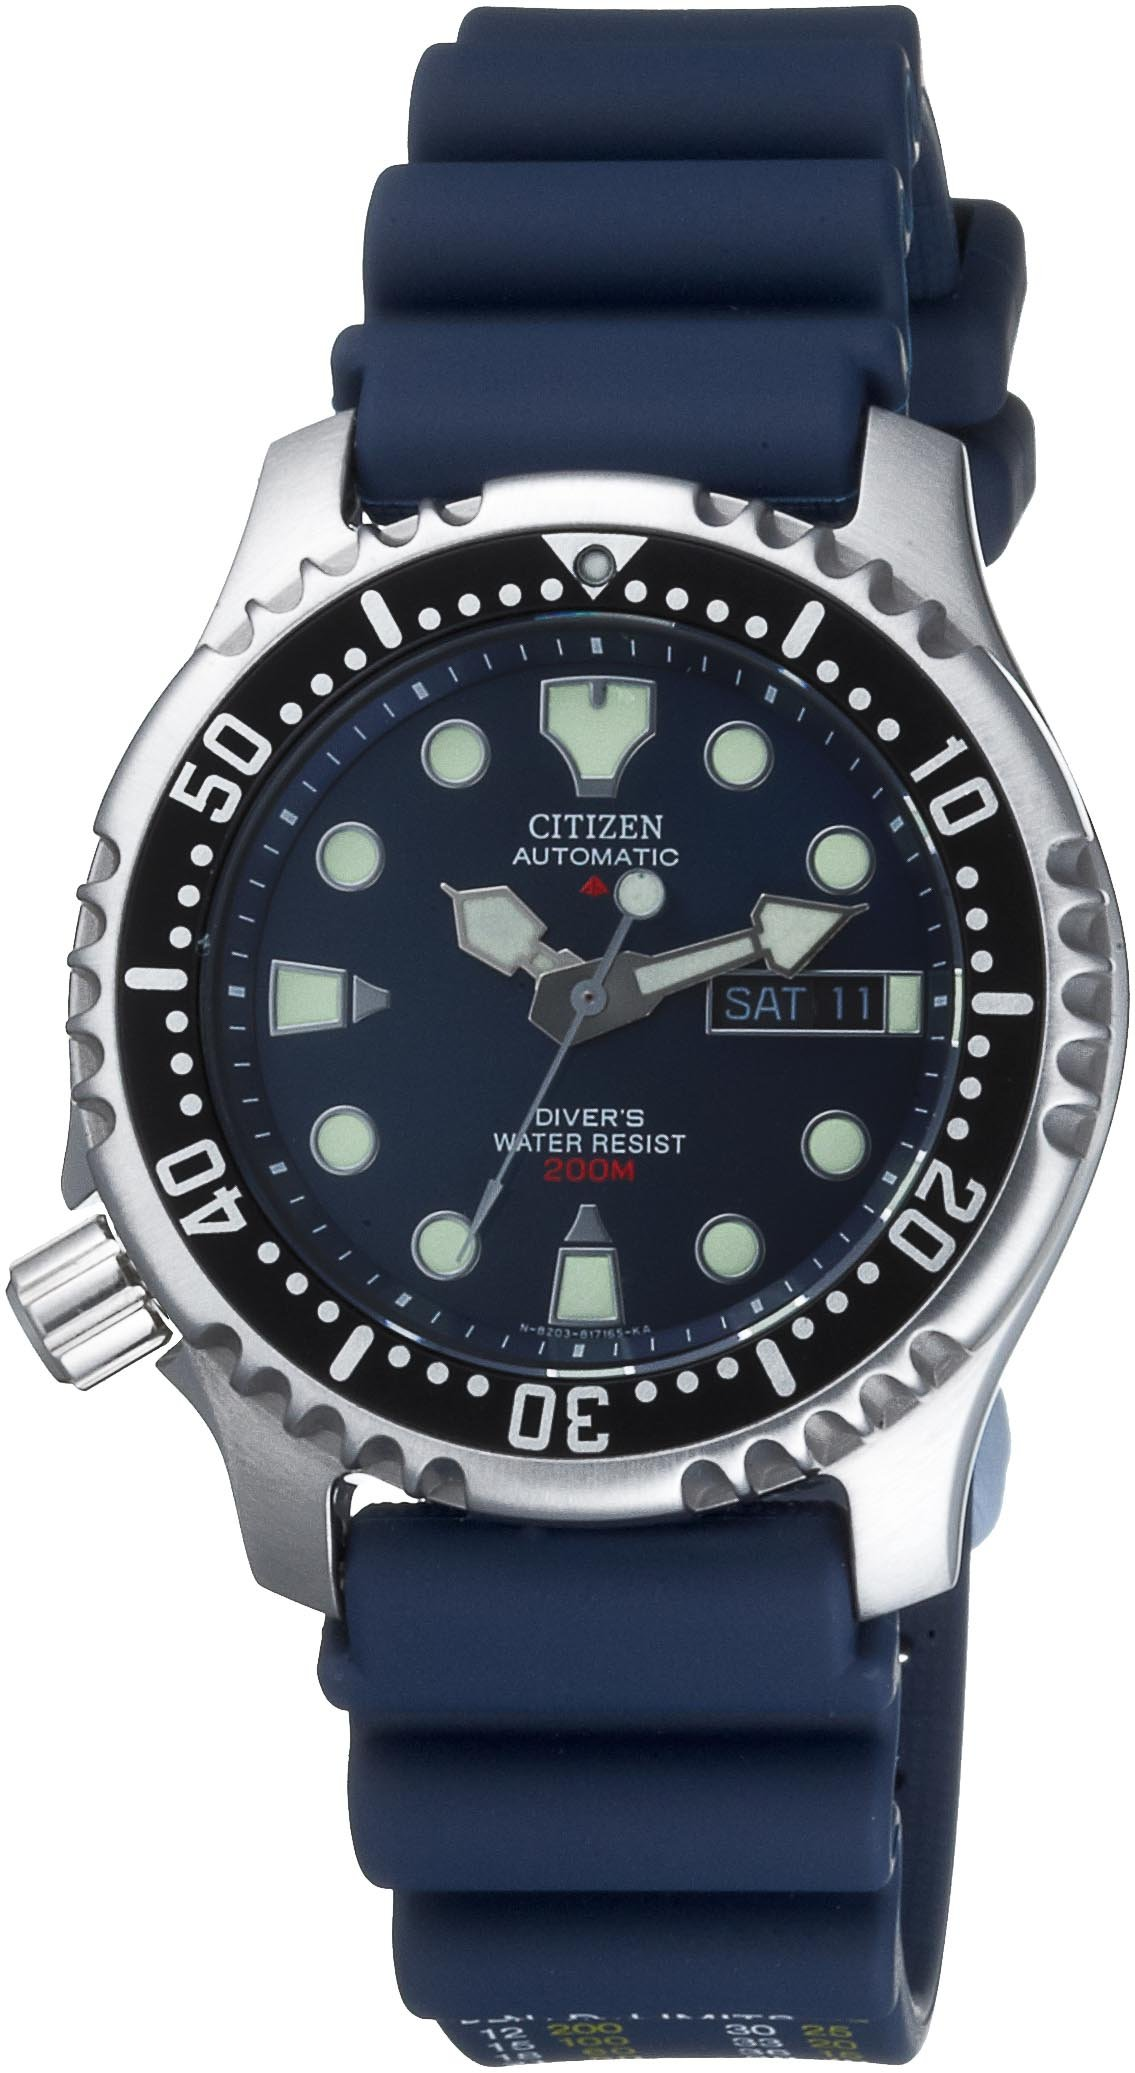 Citizen Reloj Analógico para Hombre de Automático con Correa en Plástico NY0040-17LE 2